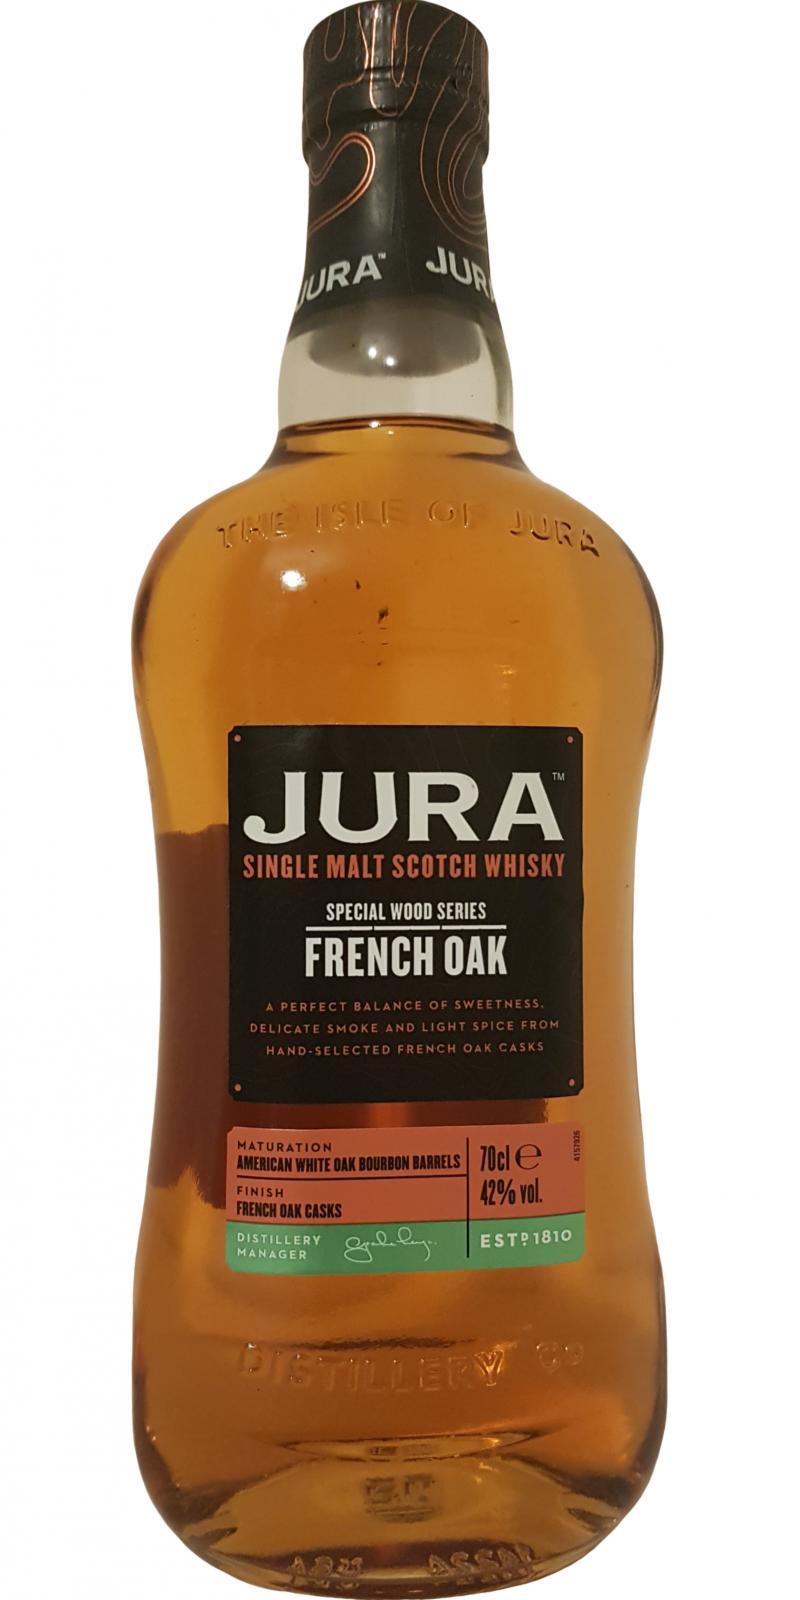 Isle of Jura Special Wood Series - French Oak